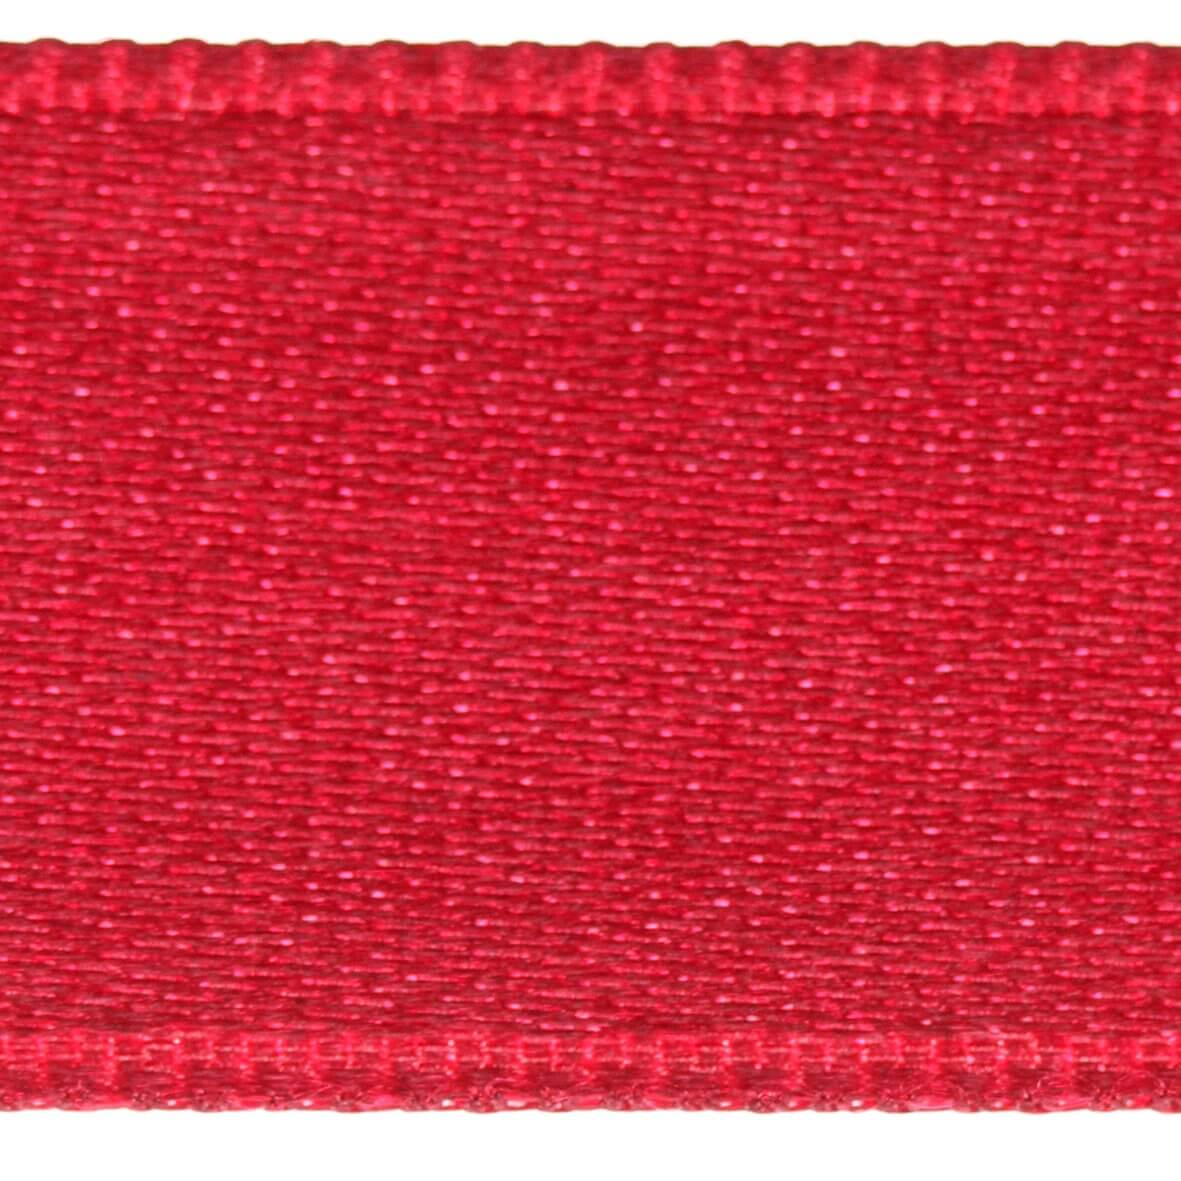 Regal Red Col. 264 - 25mm Satab Satin Ribbon